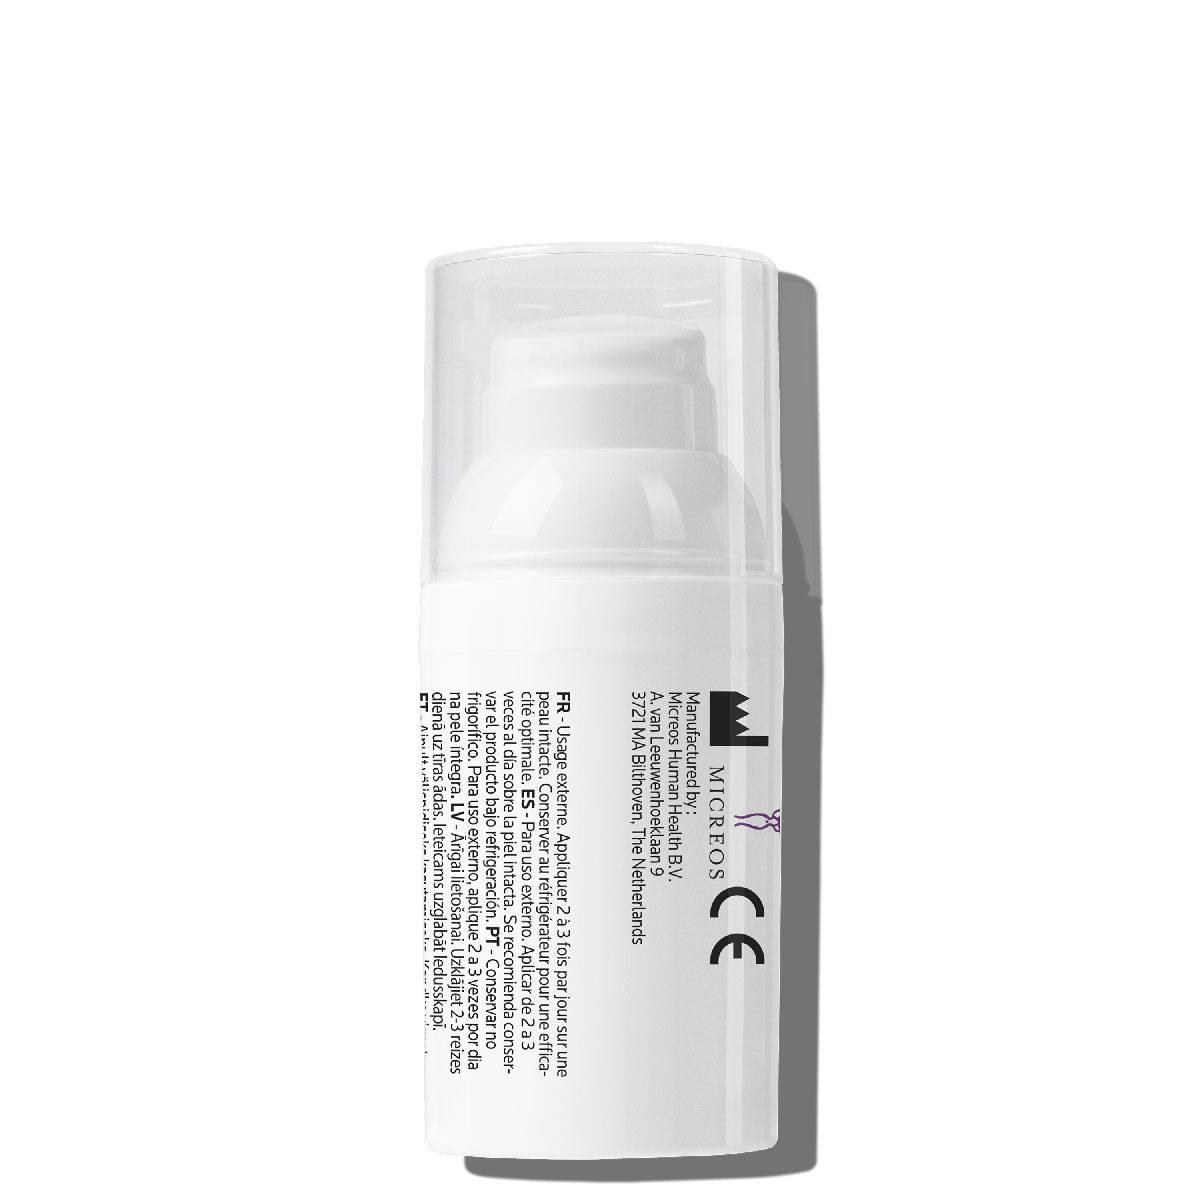 La-Roche-Posay-Lipikar-Eczema-Med-packshot-back-3337875771214